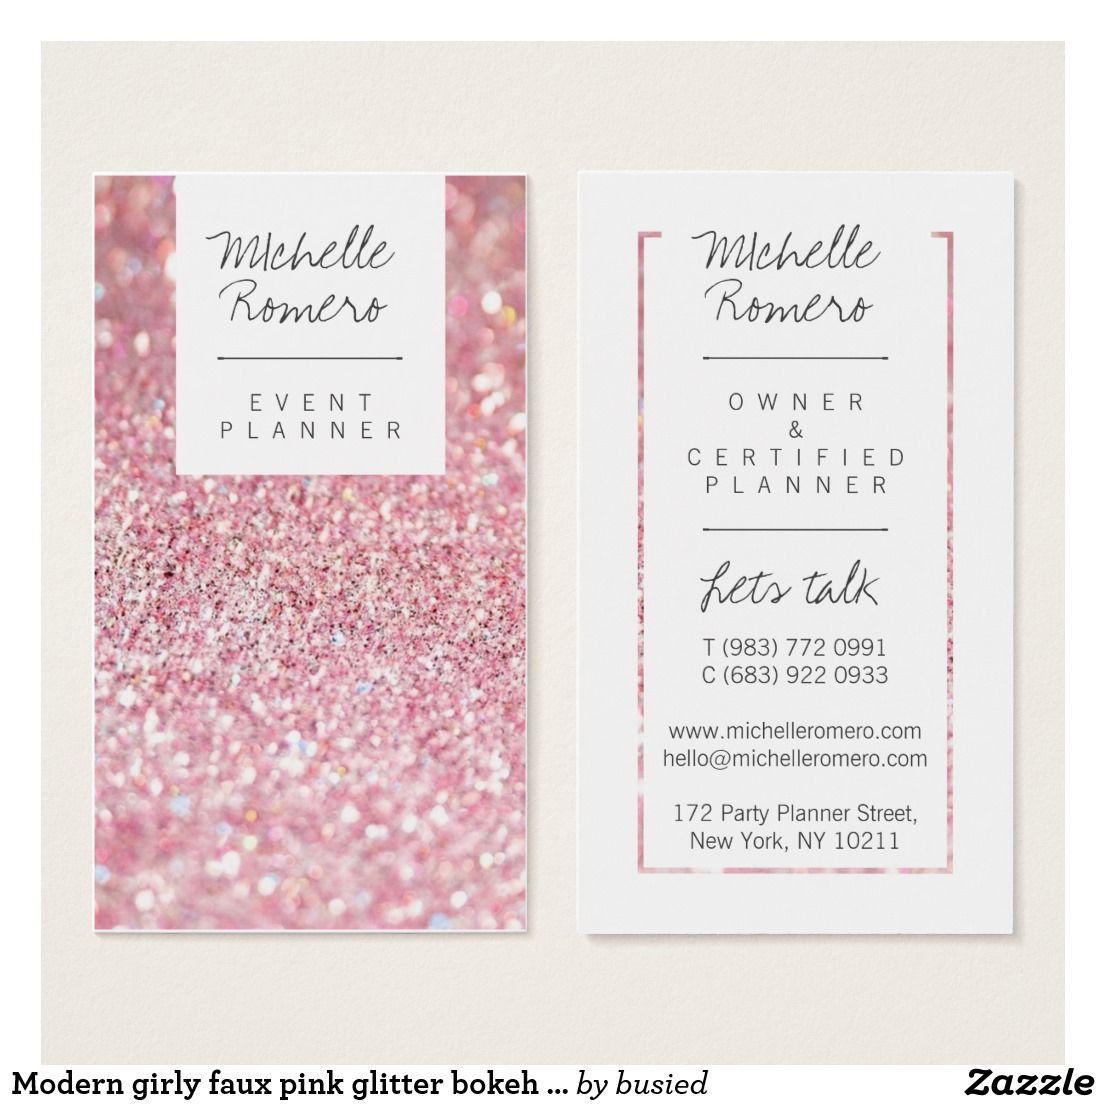 Modern girly faux pink glitter bokeh event planner business card ...